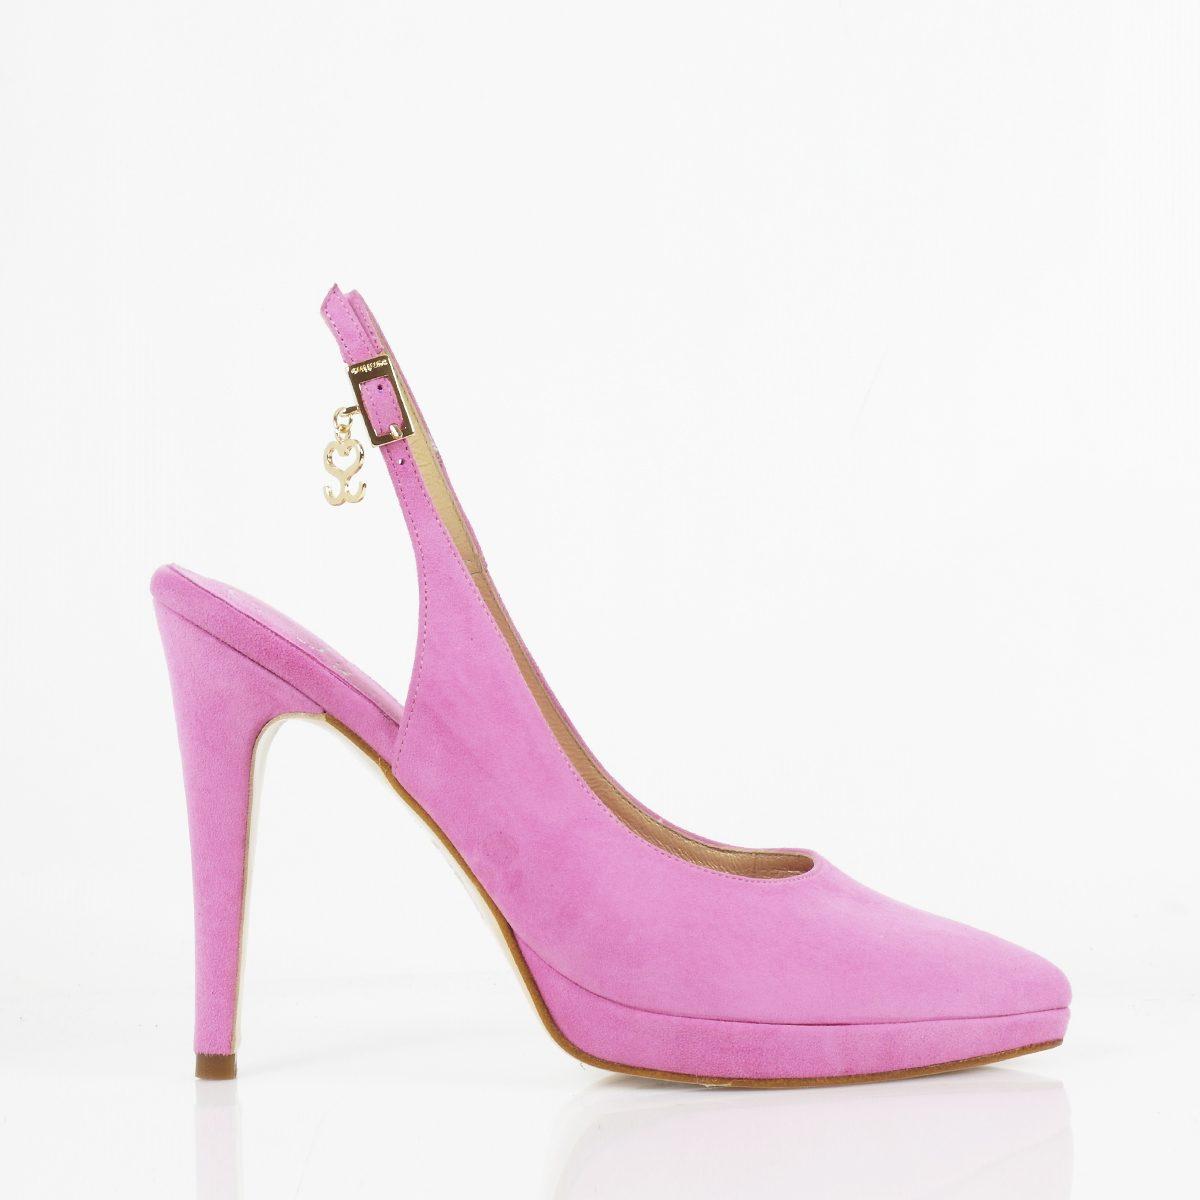 SALON MOD.1864 (11cm) - Zapatos Personalizados Fiesta